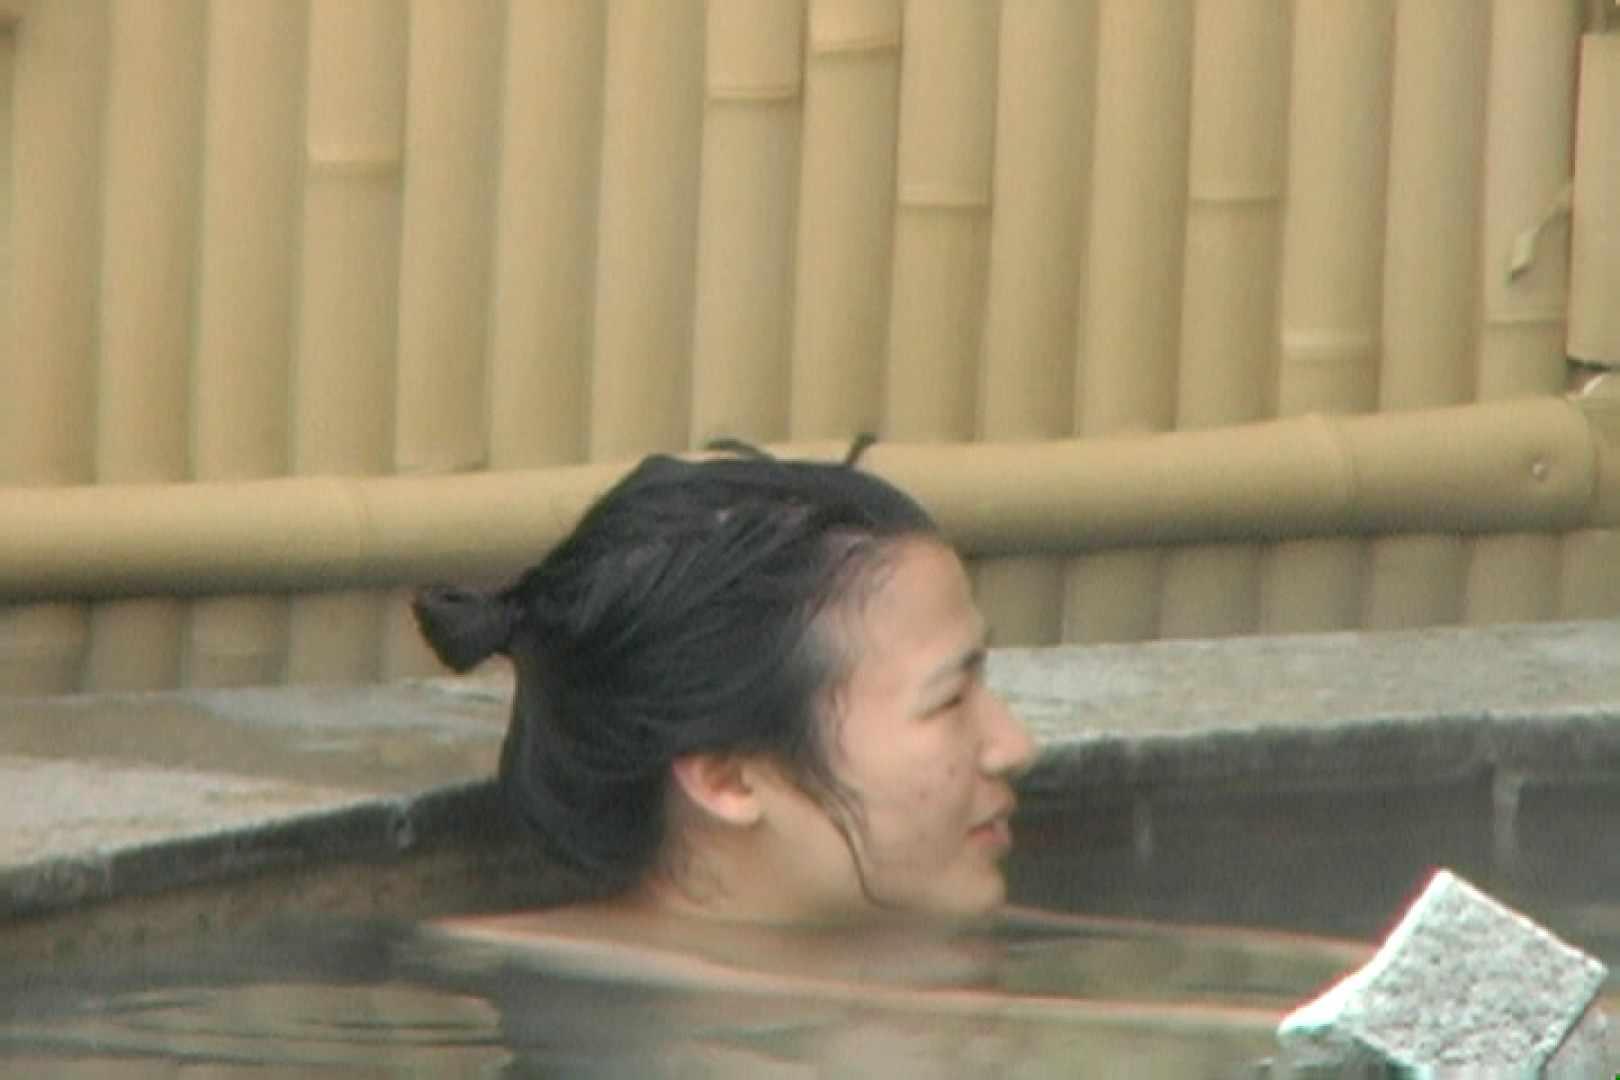 Aquaな露天風呂Vol.647 0   0  58連発 45